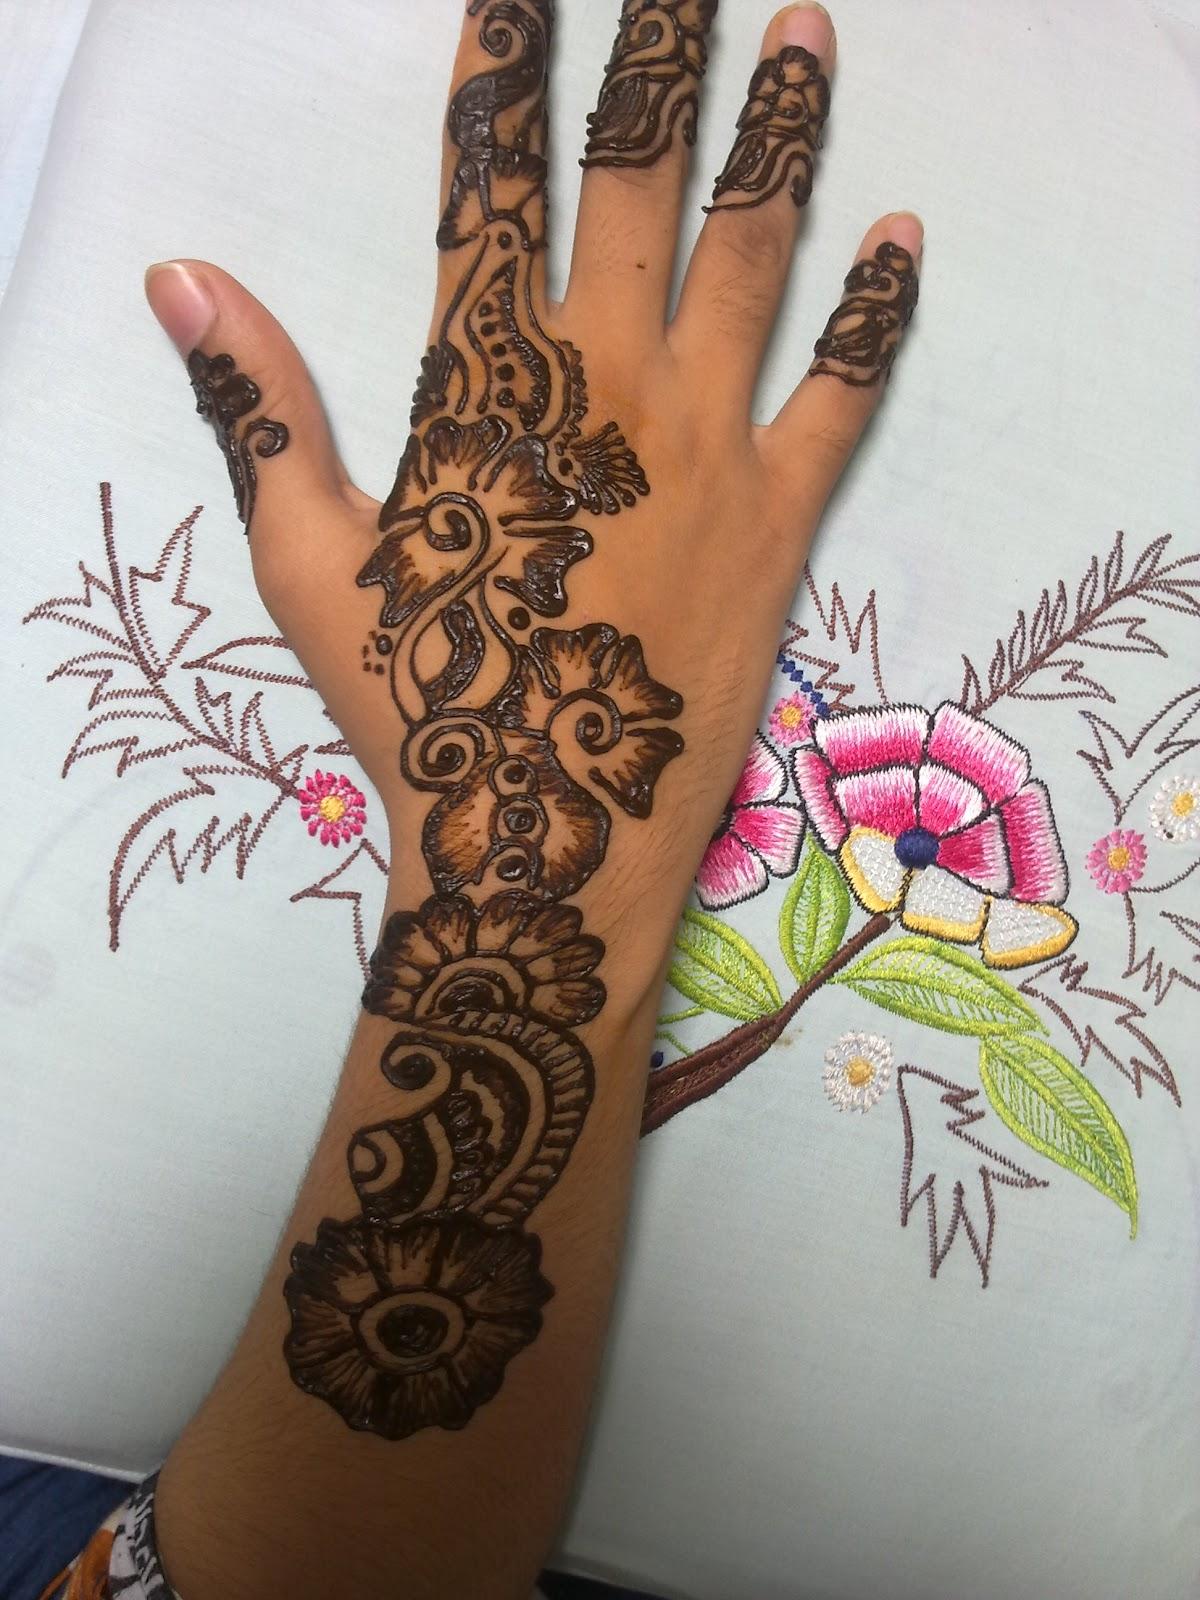 Bridal mehndi 2013 - Latest Wedding Mehndi Designs For Hands 2013